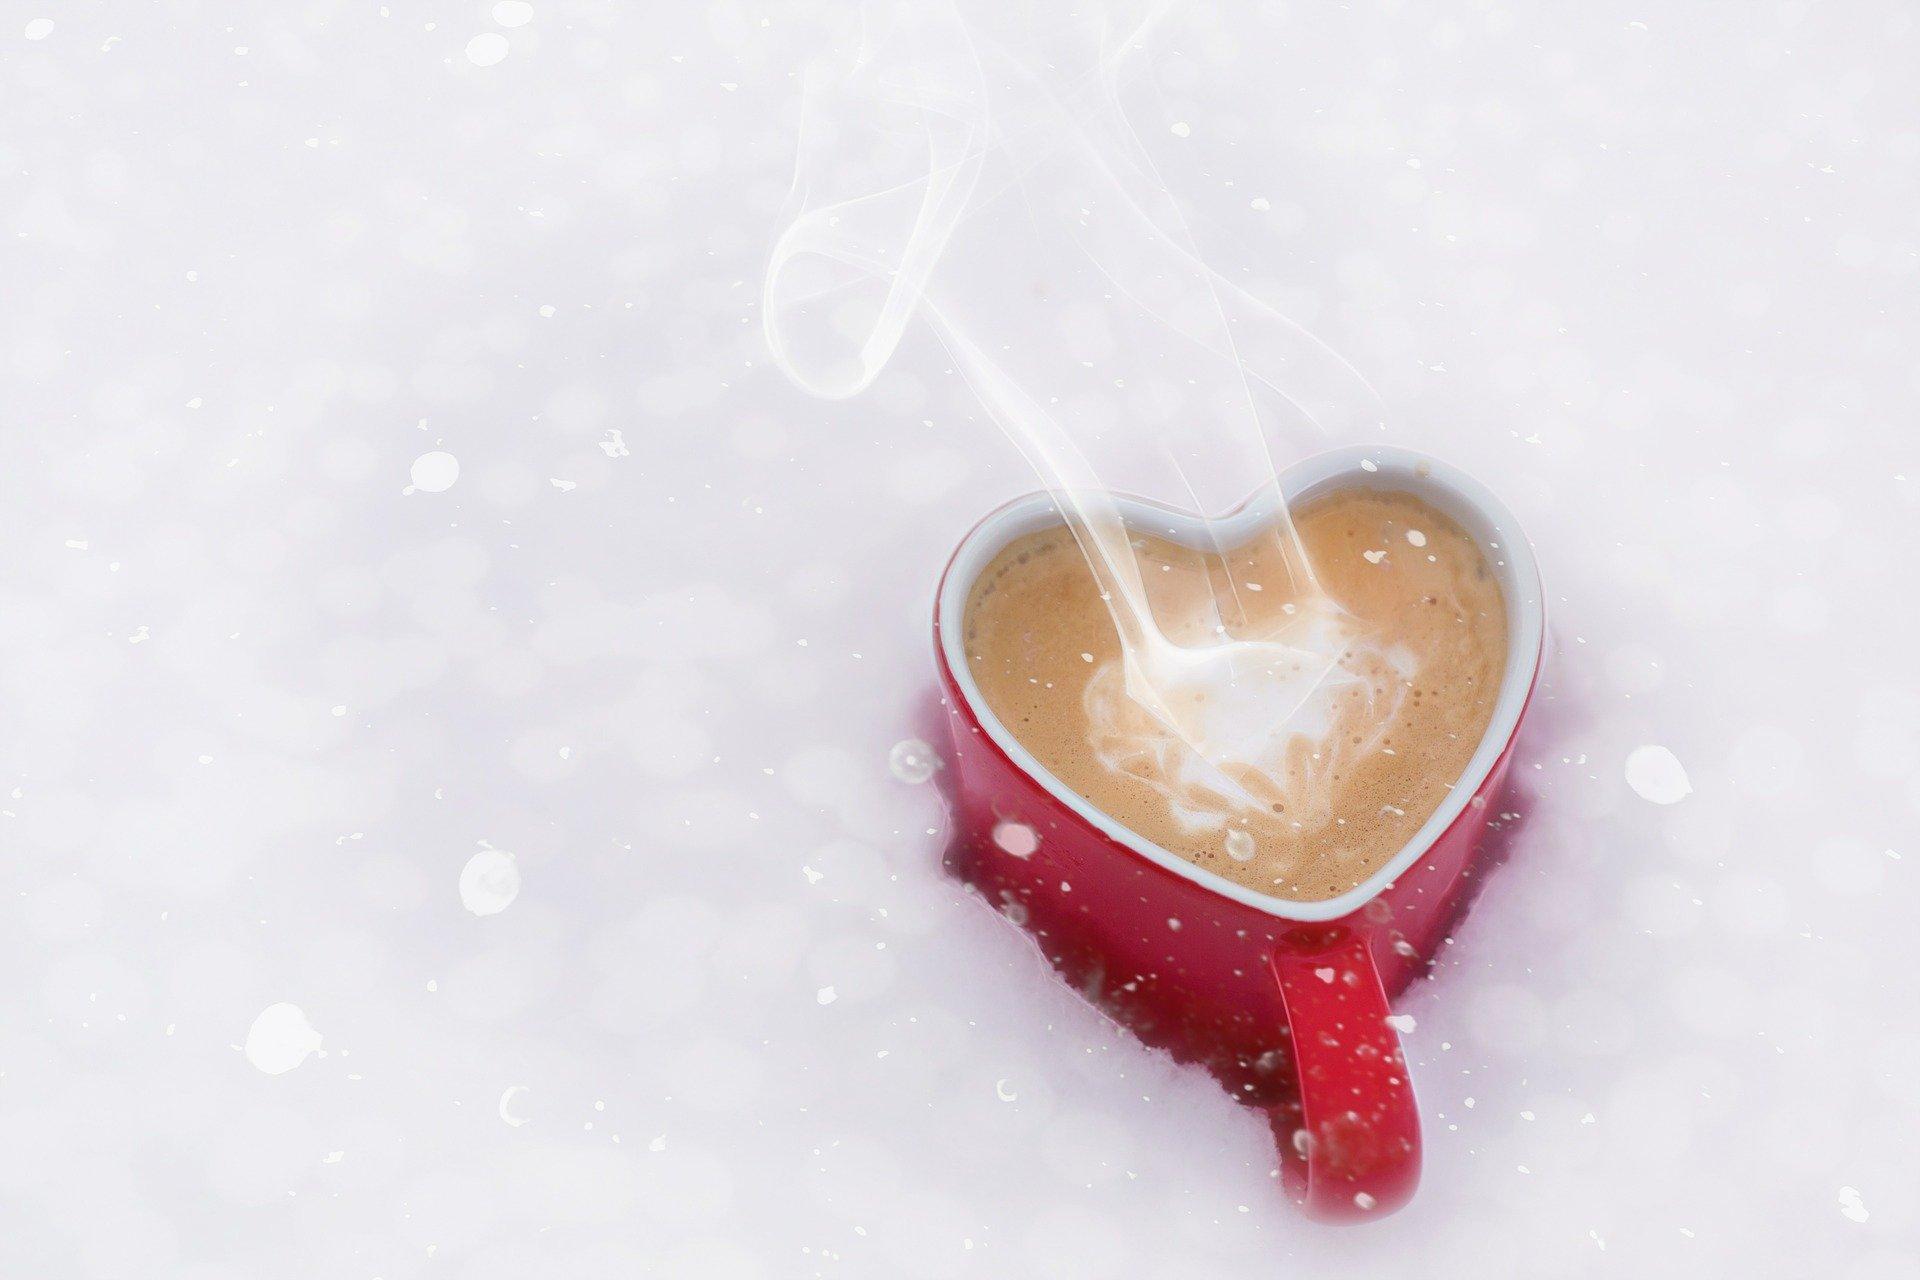 pomysły na randkę zimą